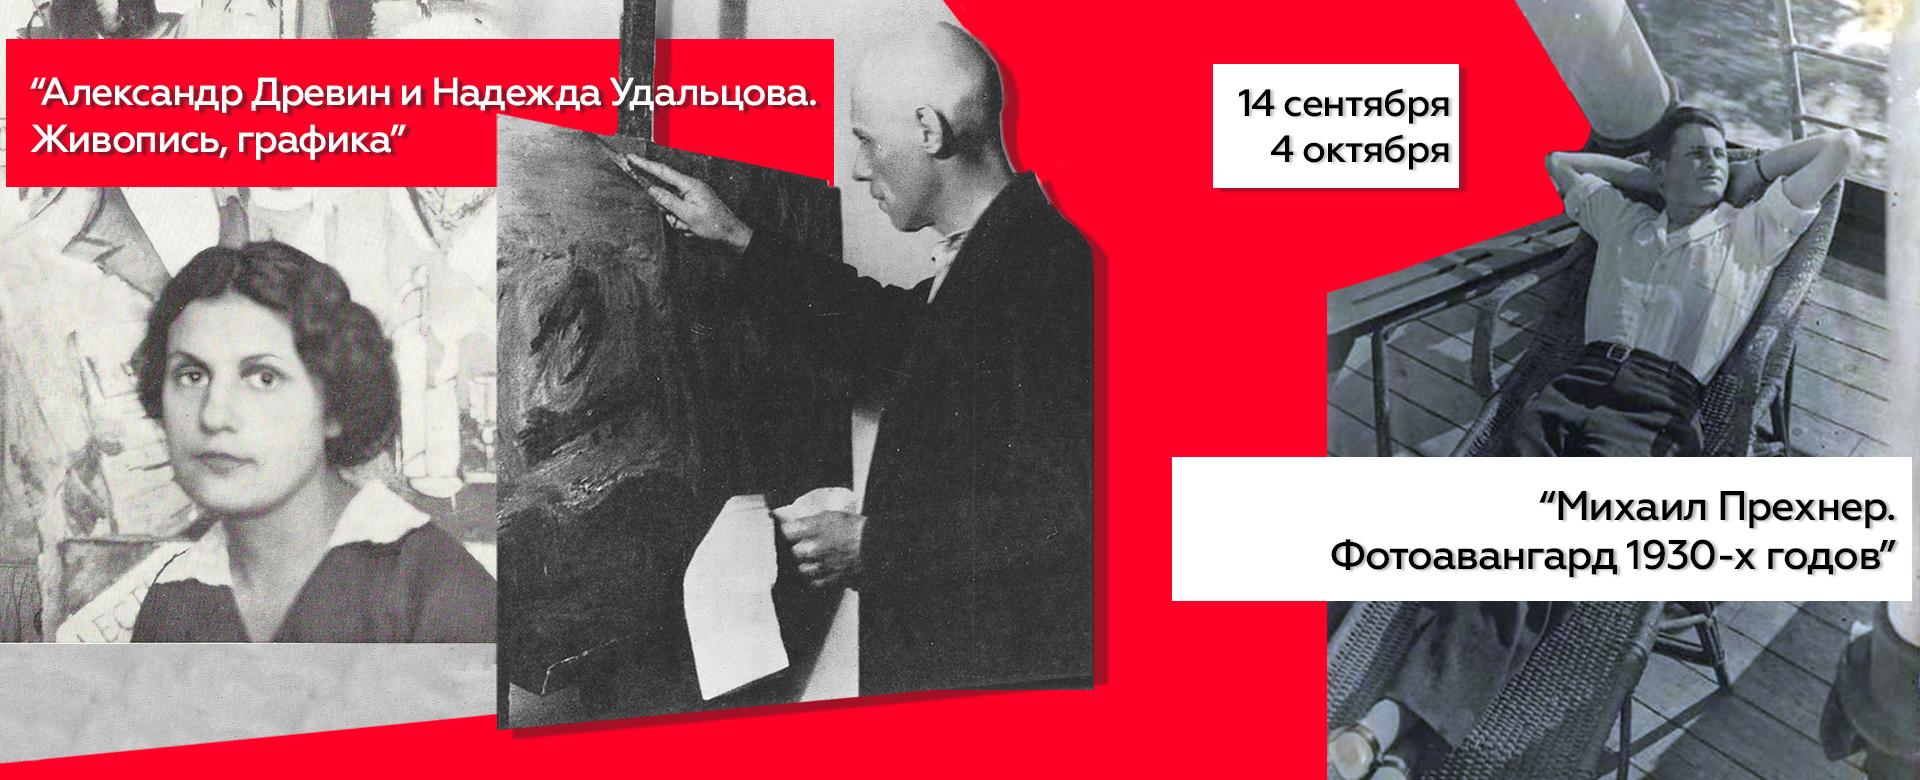 Platonov Festival exhibitions